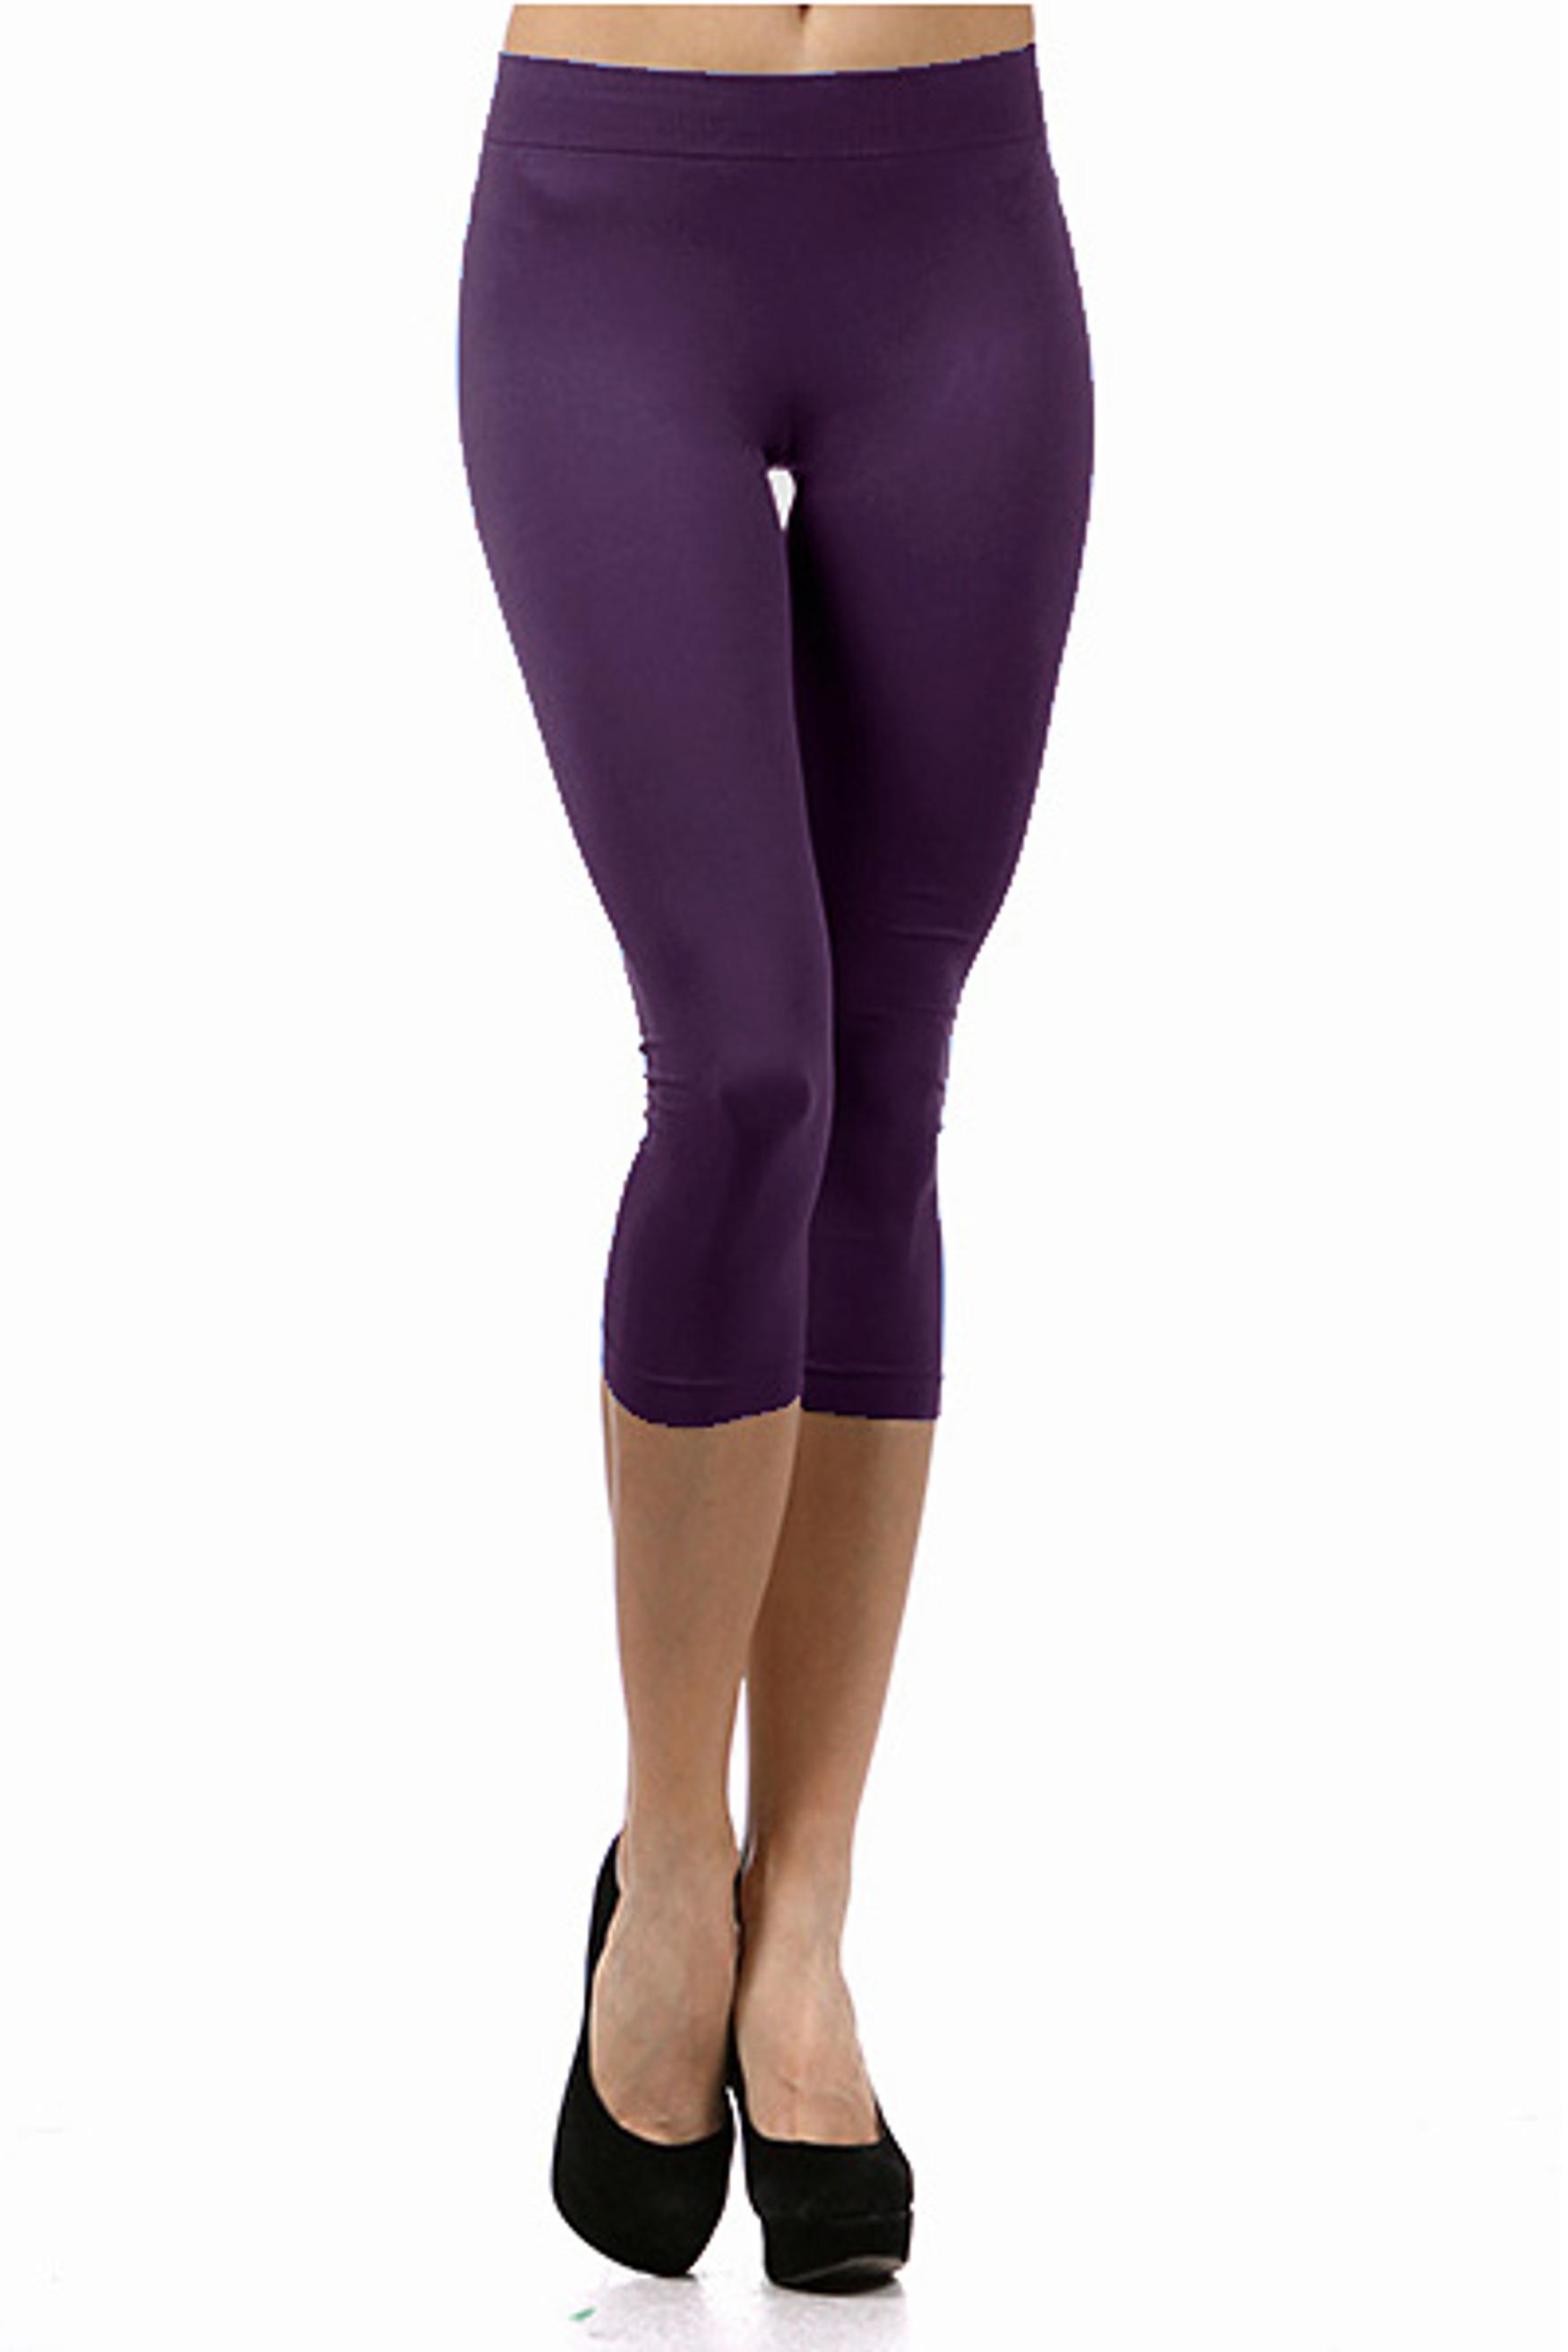 Basic Capri Length Spandex Leggings Purple